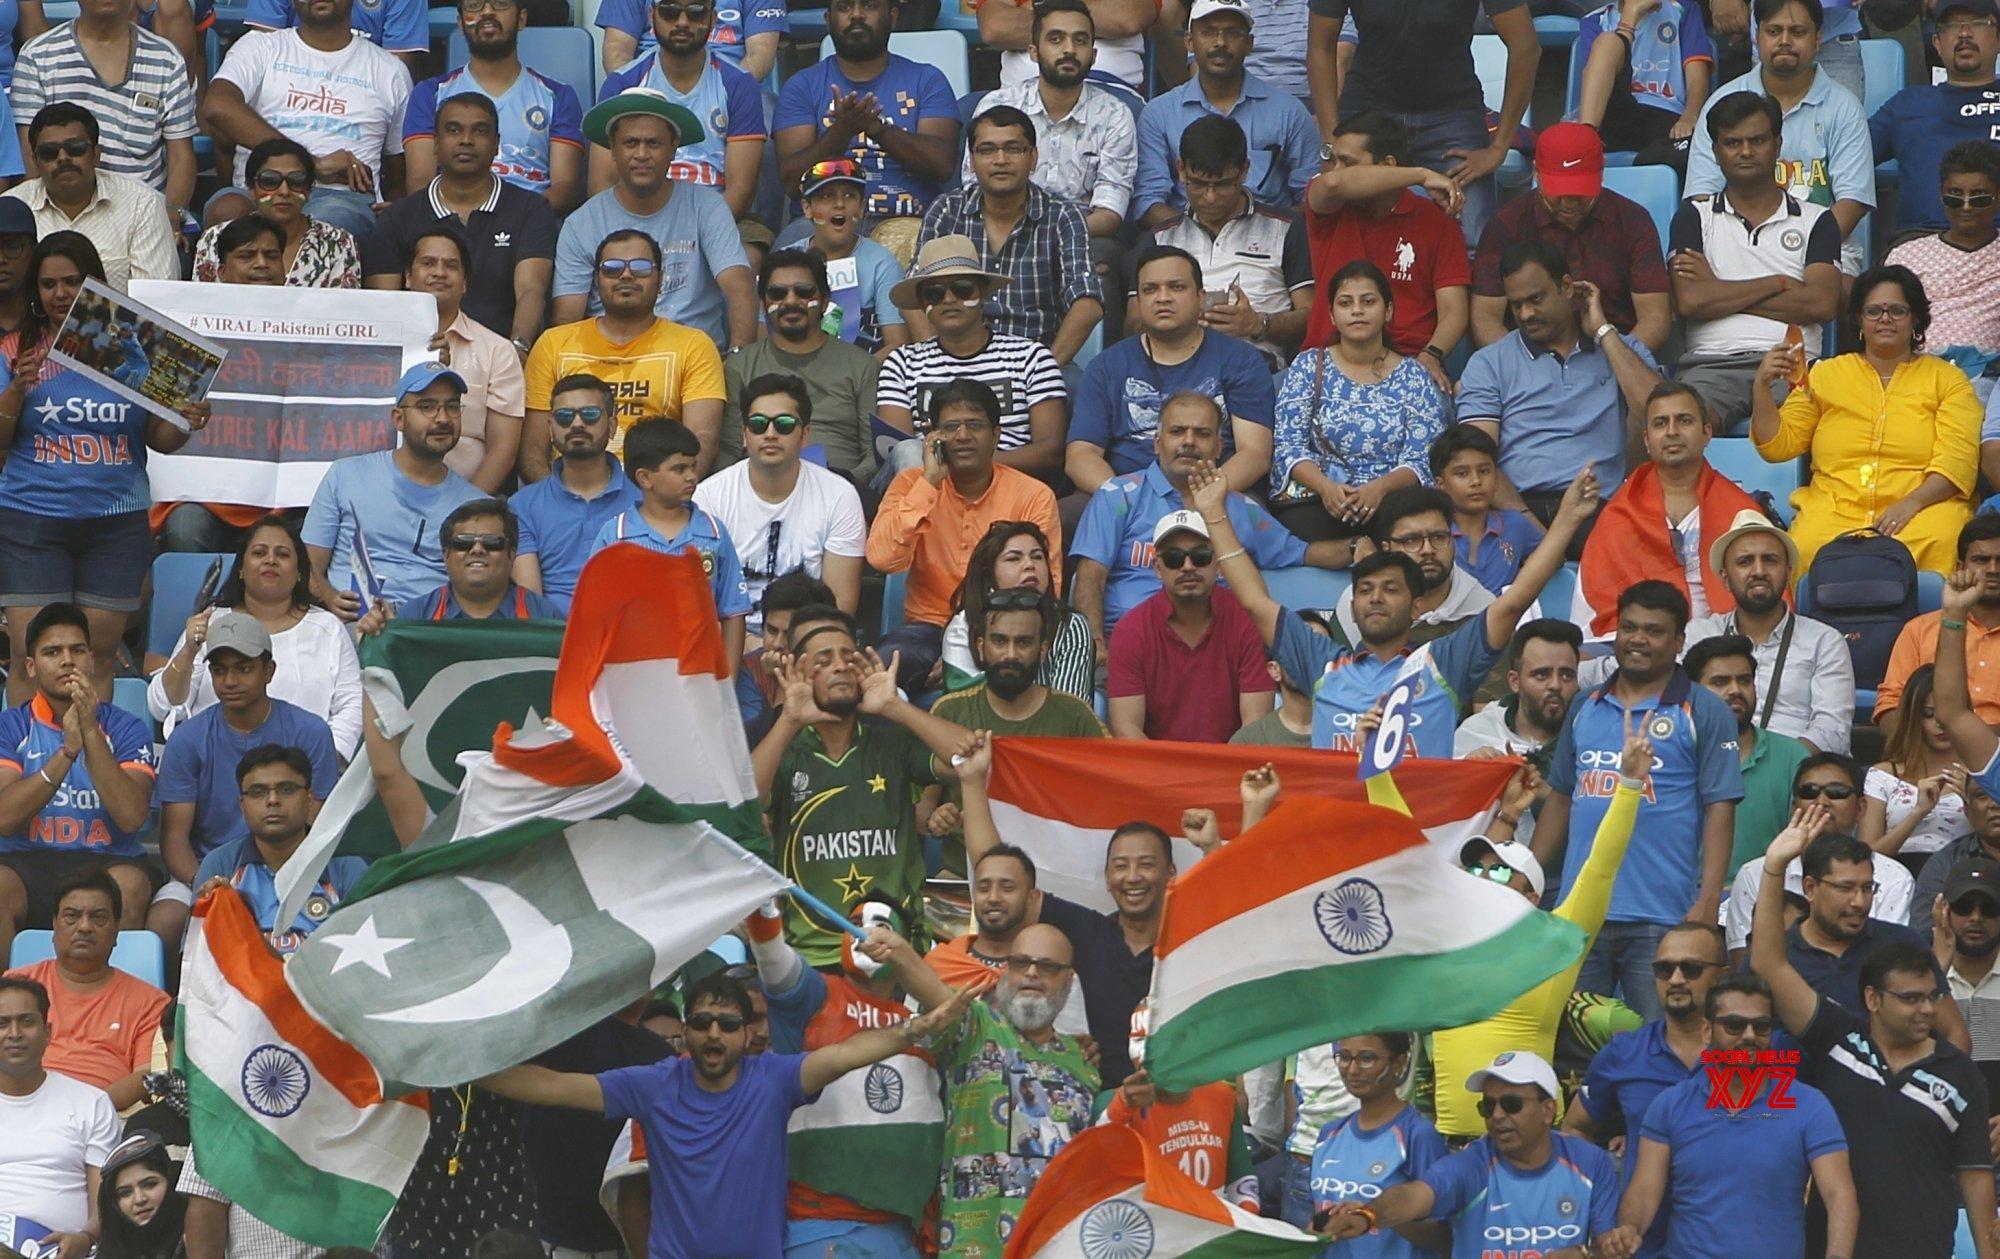 Fans gear up for high-octane clash between India & Pakistan